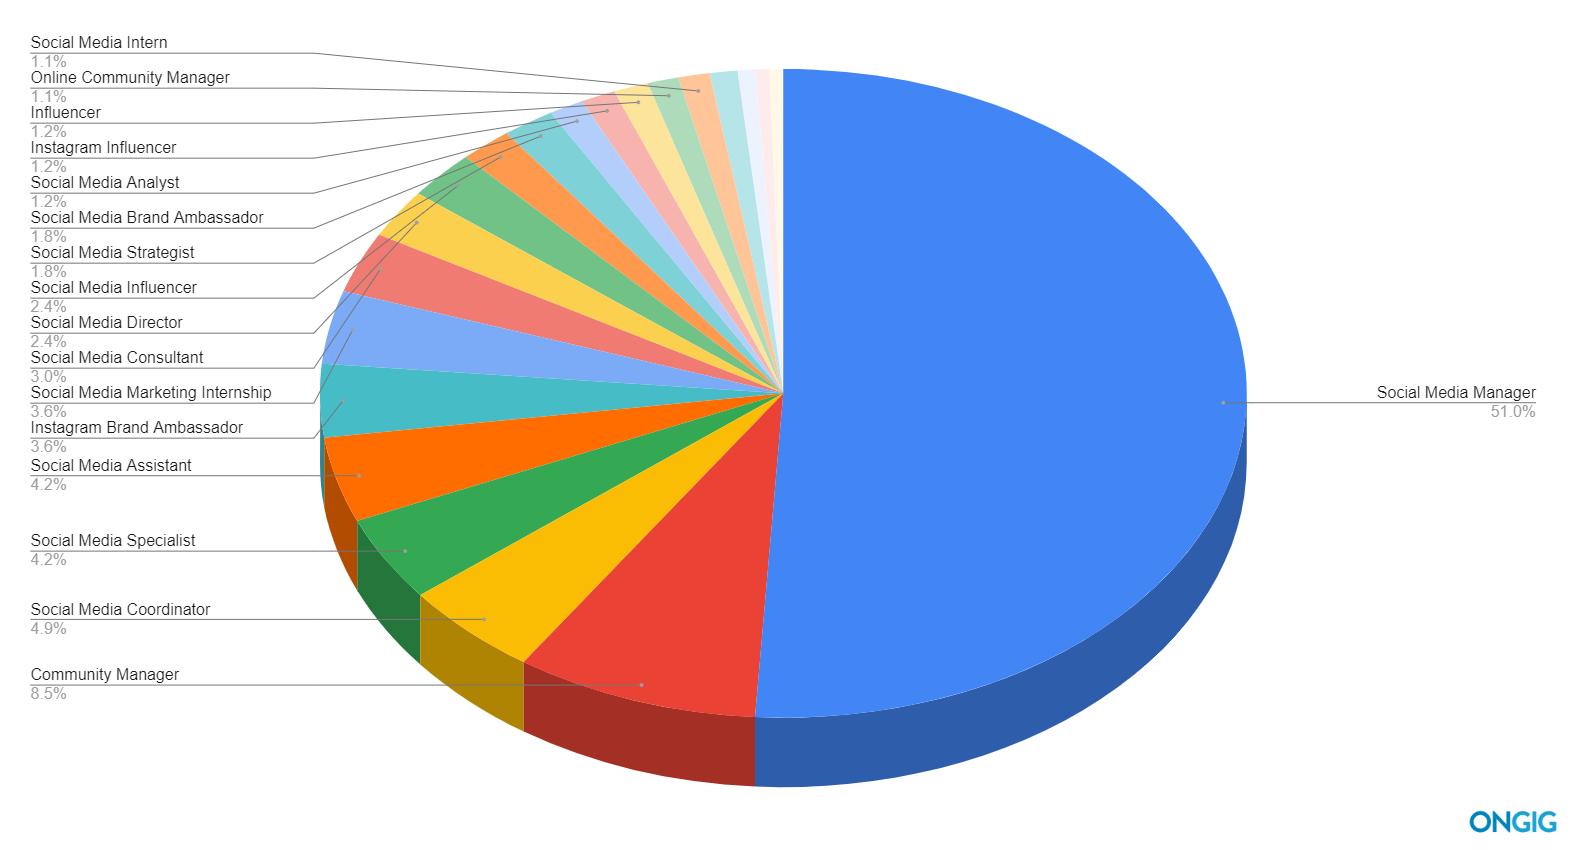 social media job titles pie chart